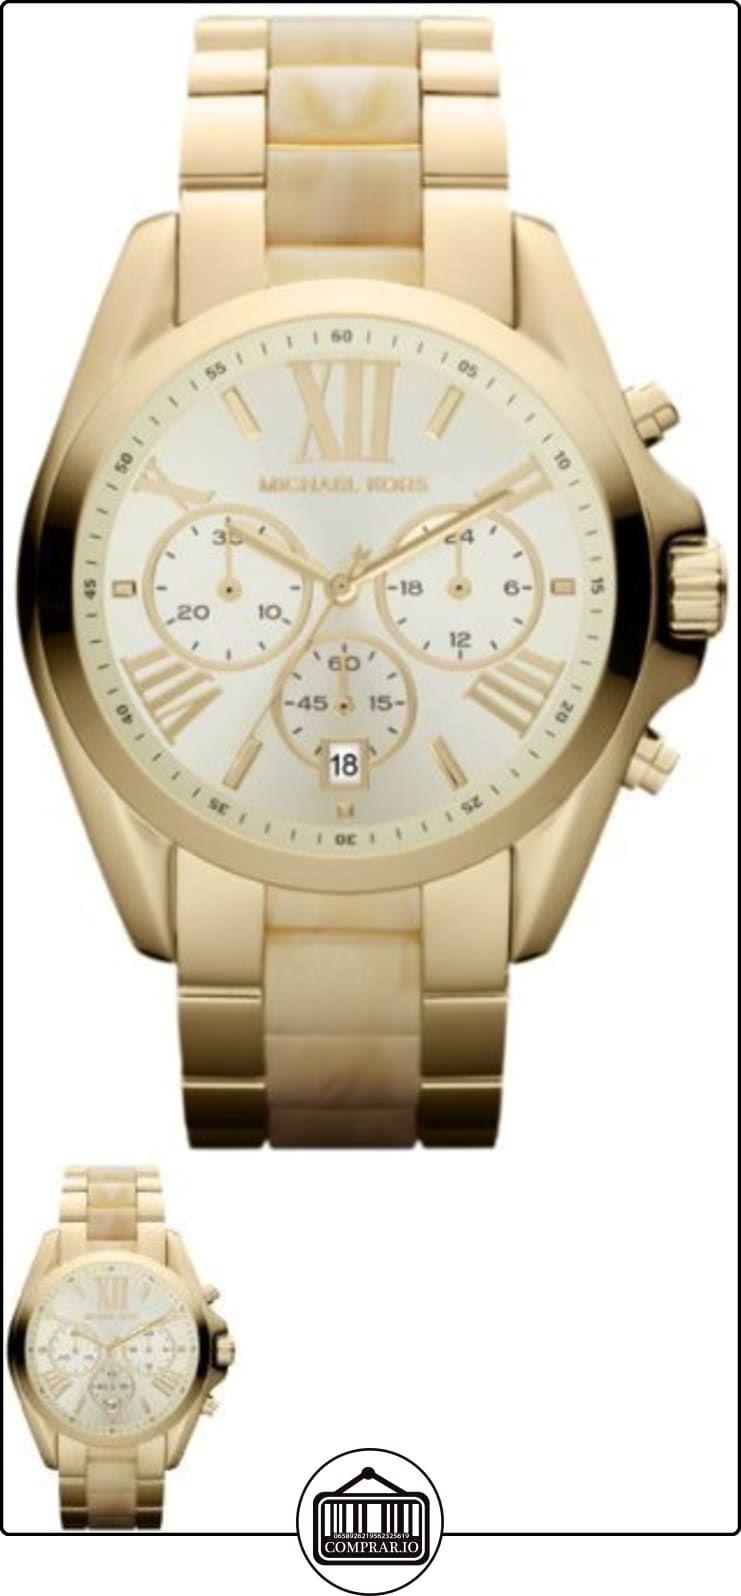 3a9fd35a7 Michael Kors MK5722 - Reloj para mujer con correa de acero/ceramica, color  dorado